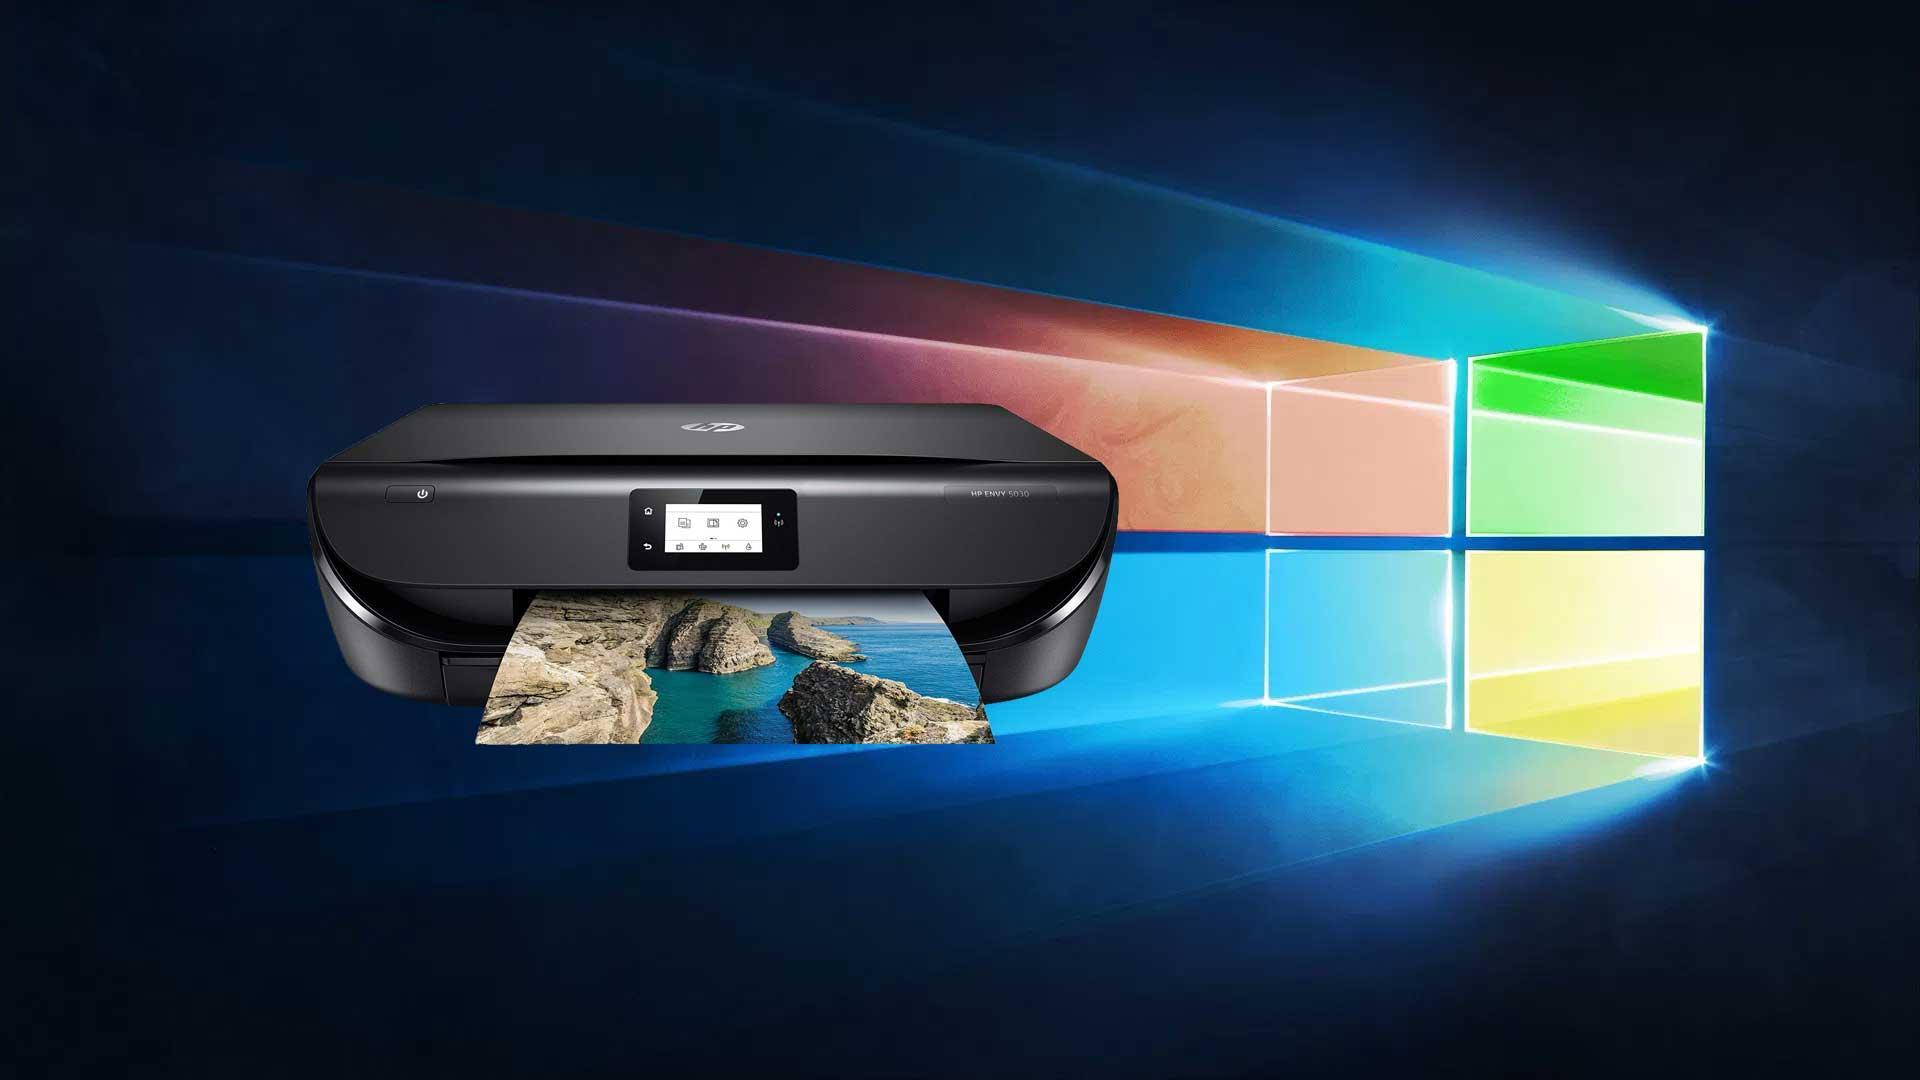 hp impresora windows 10